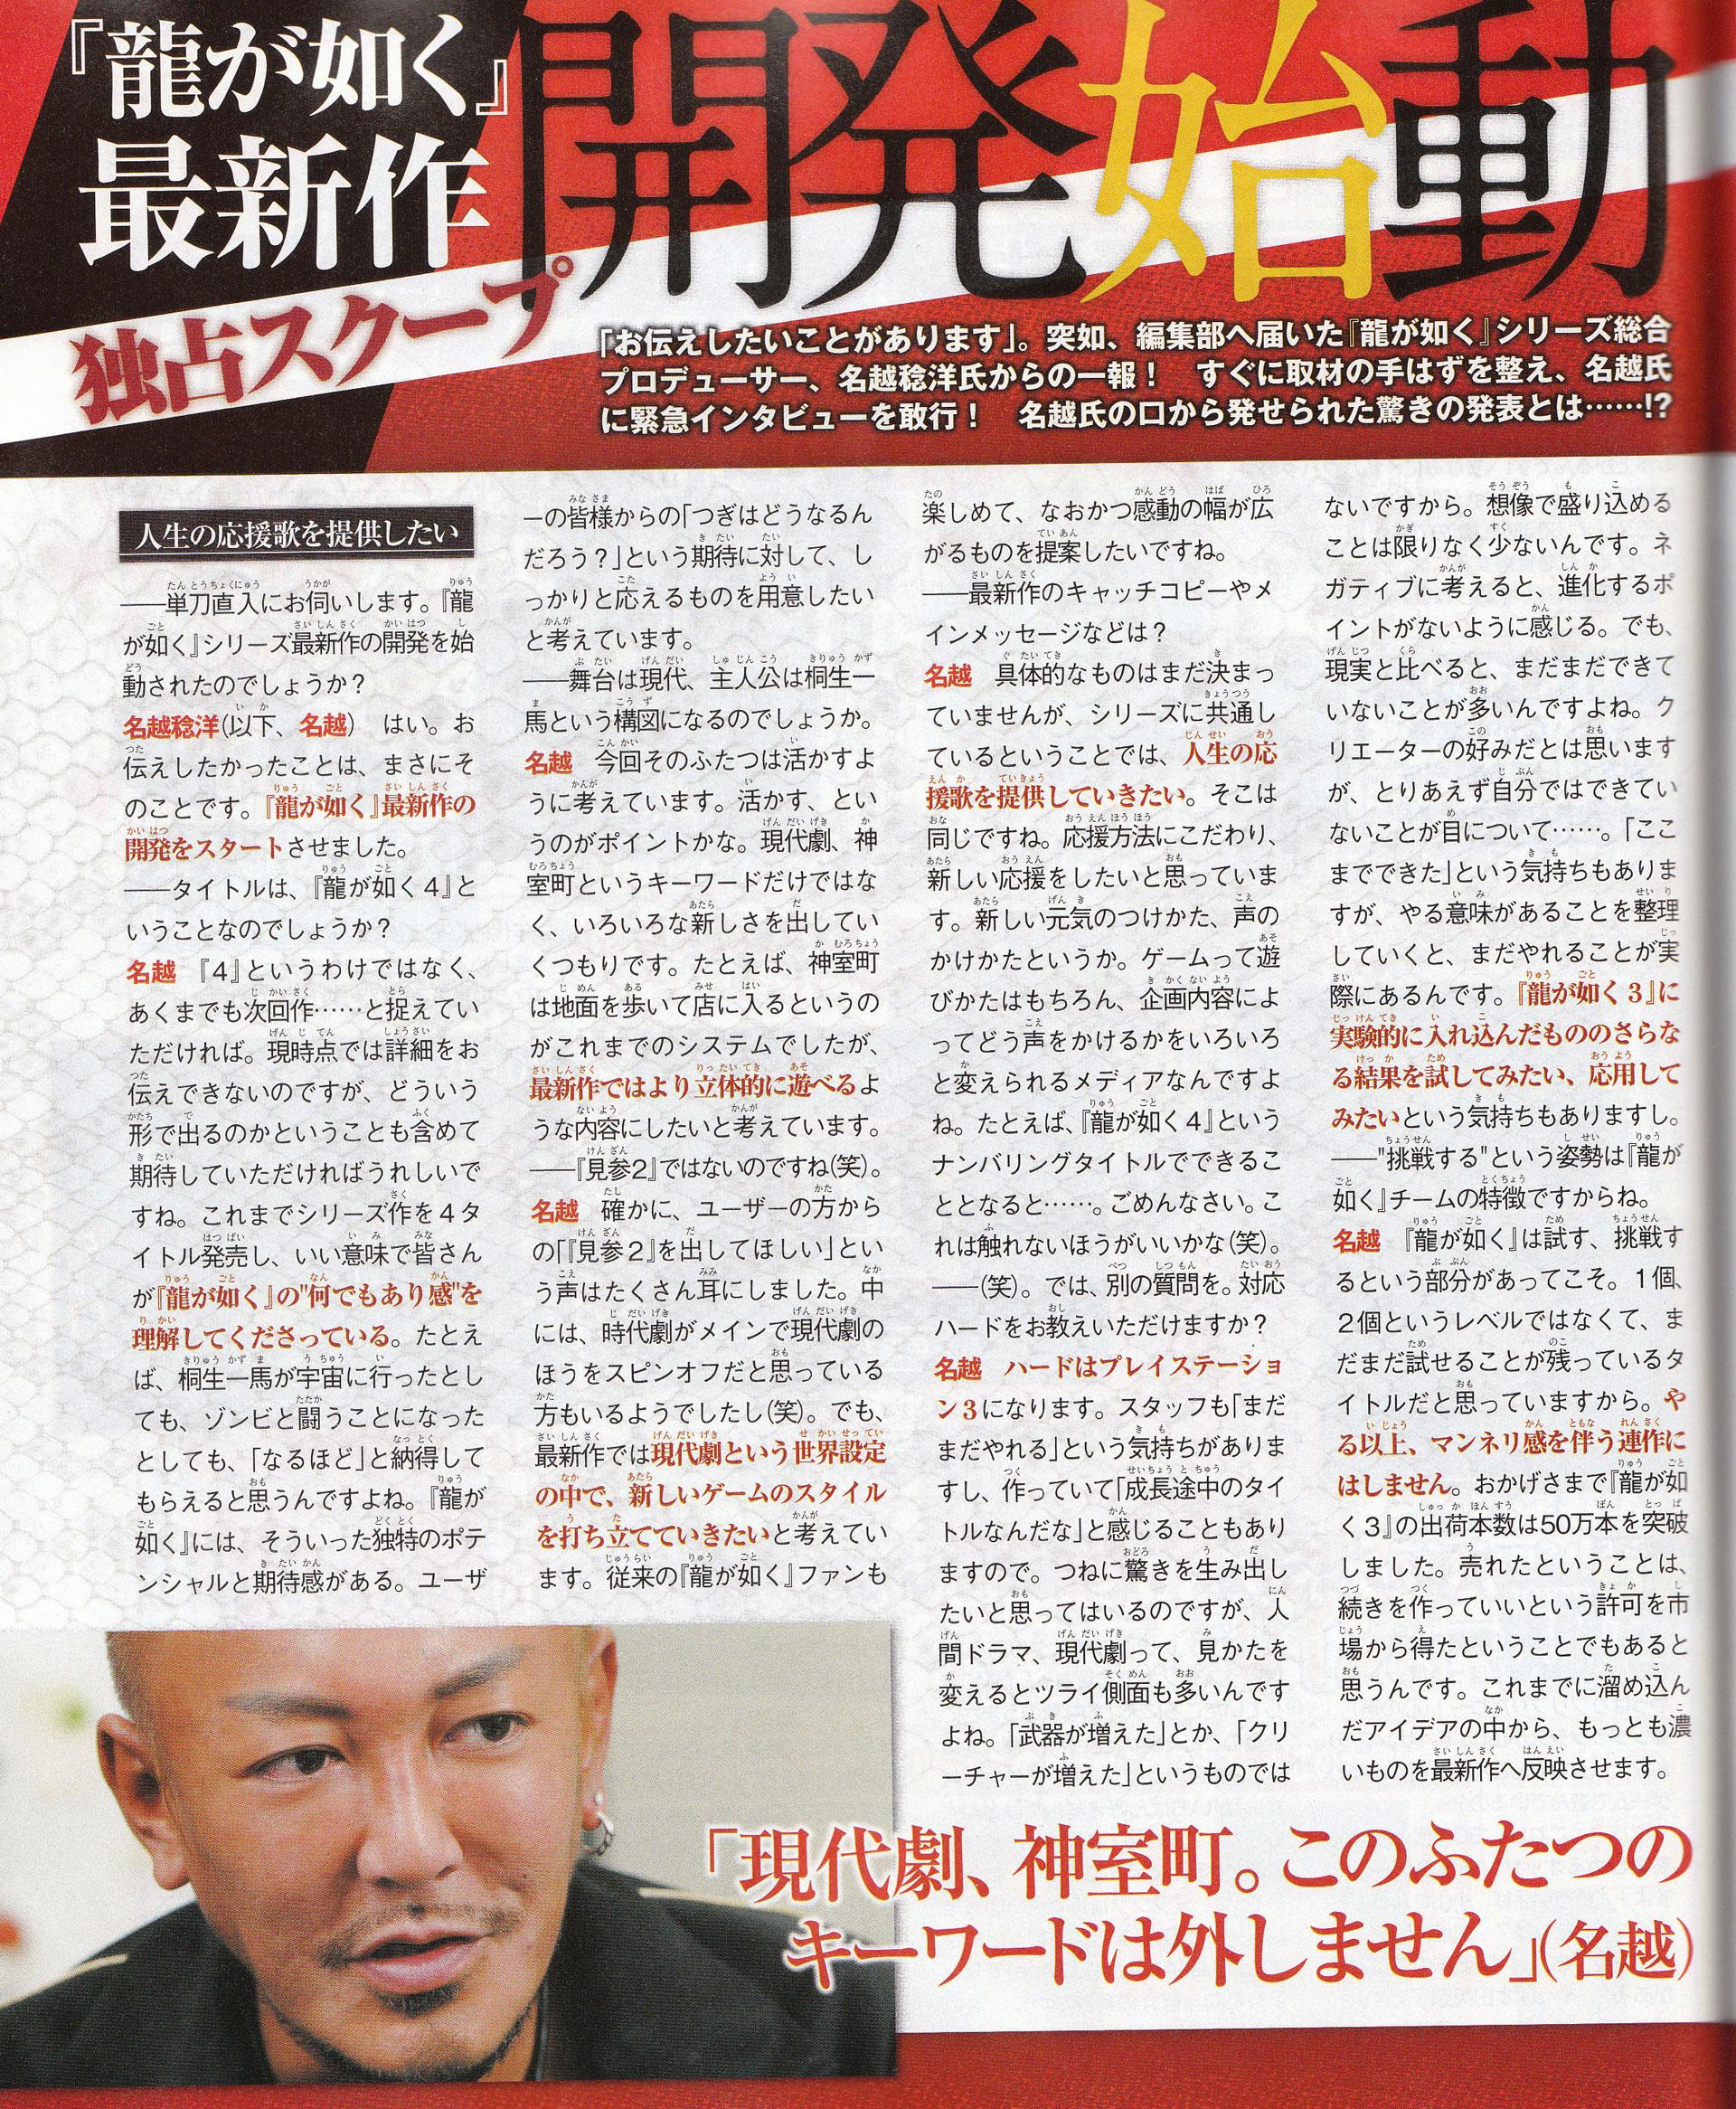 next-yakuza-in-dev-scans_2009_05-07-09_01